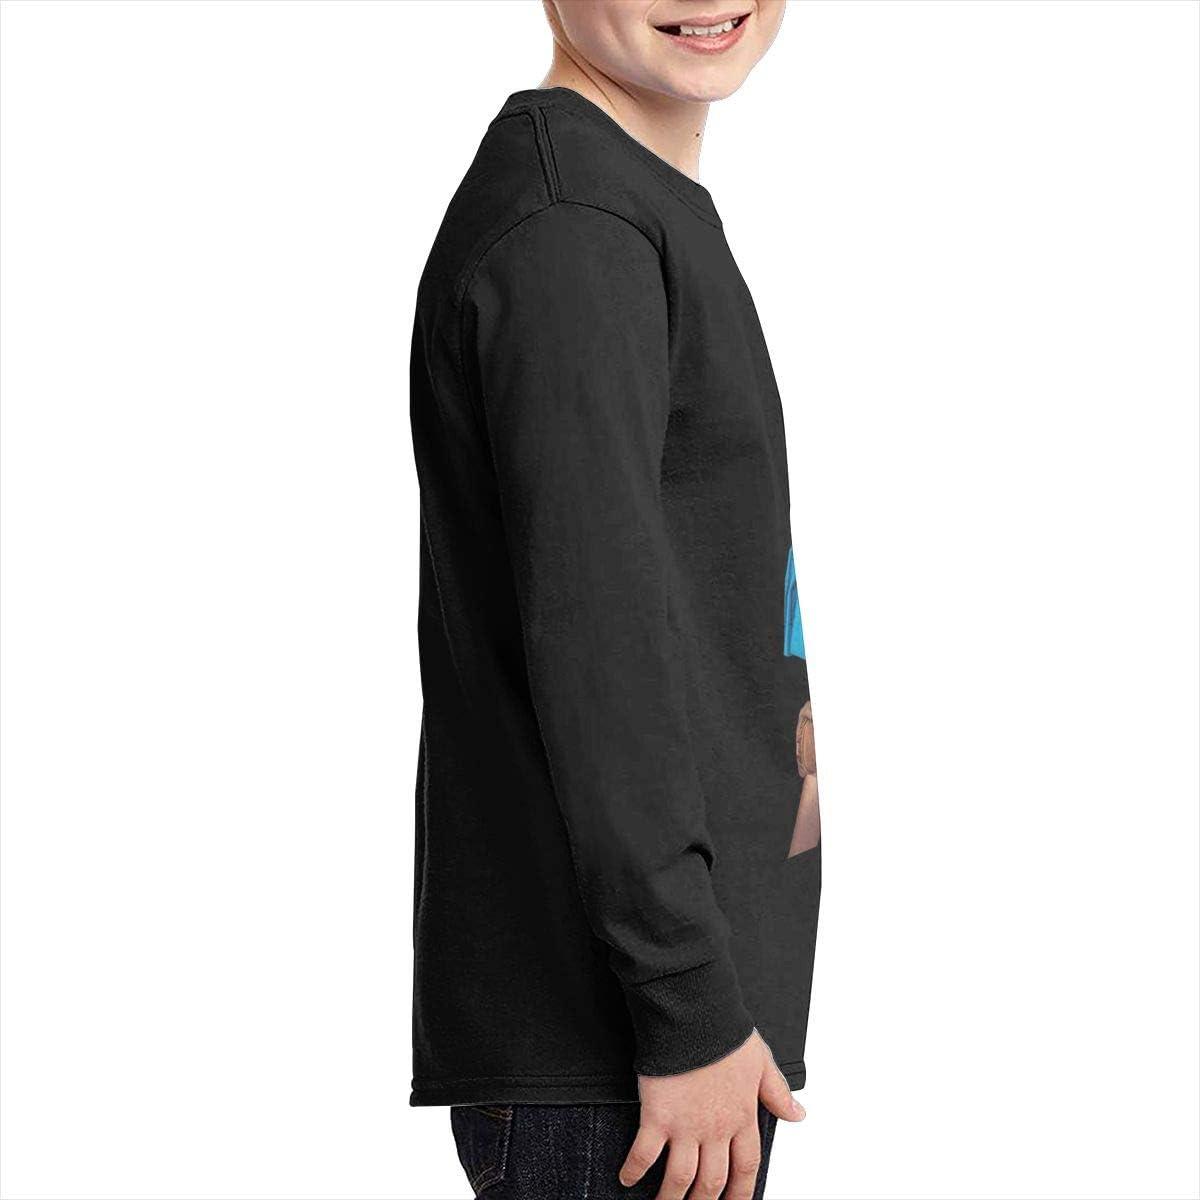 MichaelHazzard Dua Lipa Youth Fun Long Sleeve Crewneck Tee T-Shirt for Boys and Girls